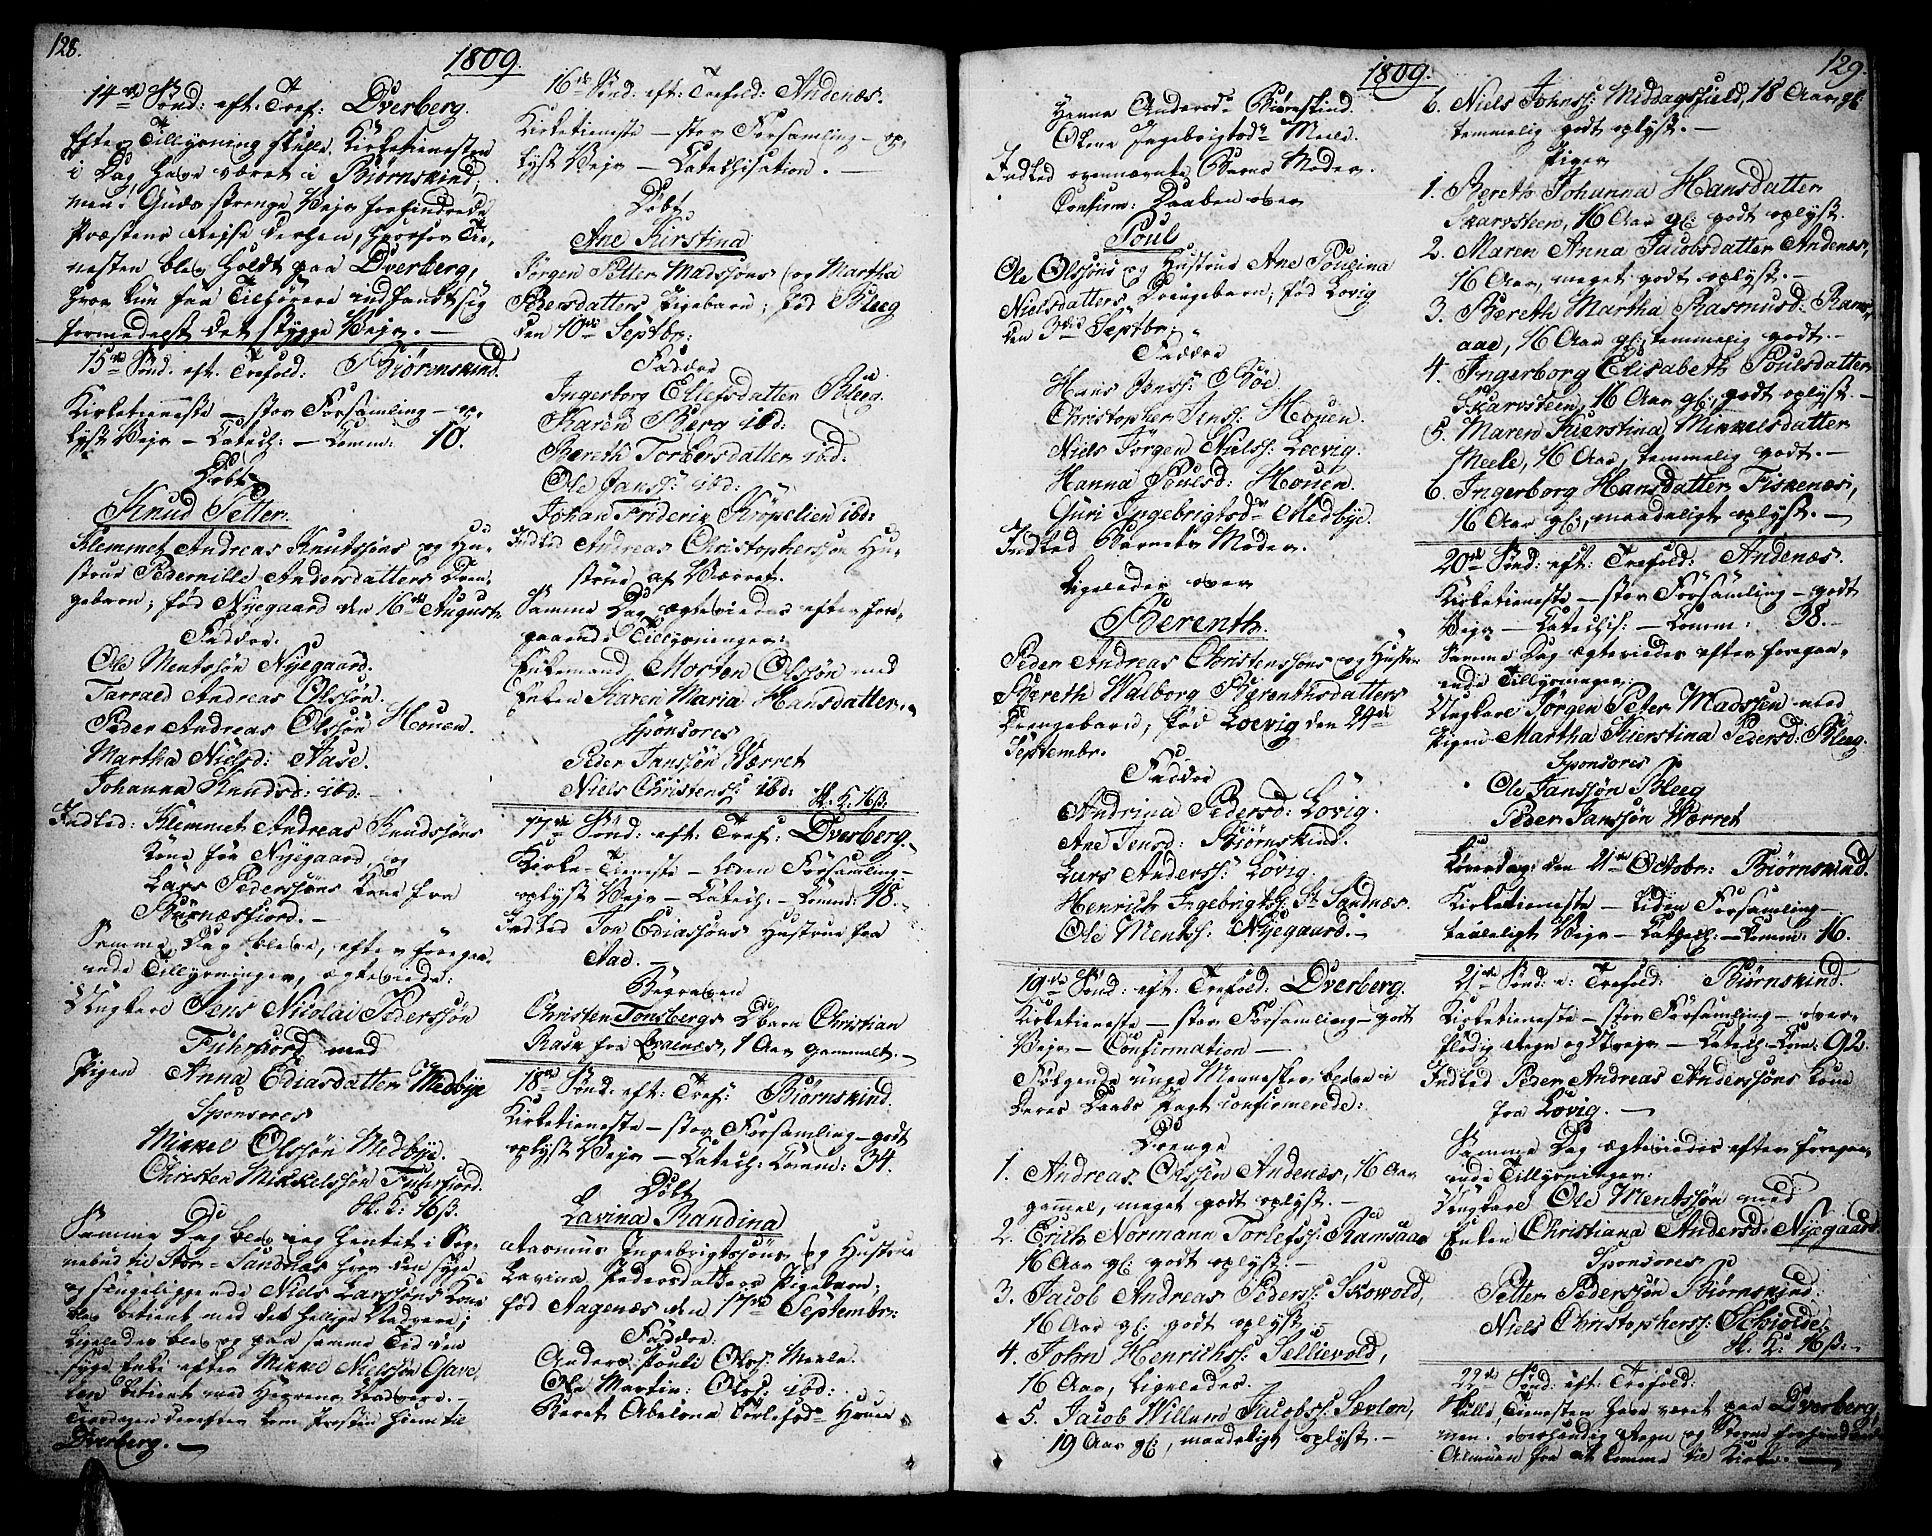 SAT, Ministerialprotokoller, klokkerbøker og fødselsregistre - Nordland, 897/L1394: Ministerialbok nr. 897A02, 1788-1820, s. 128-129